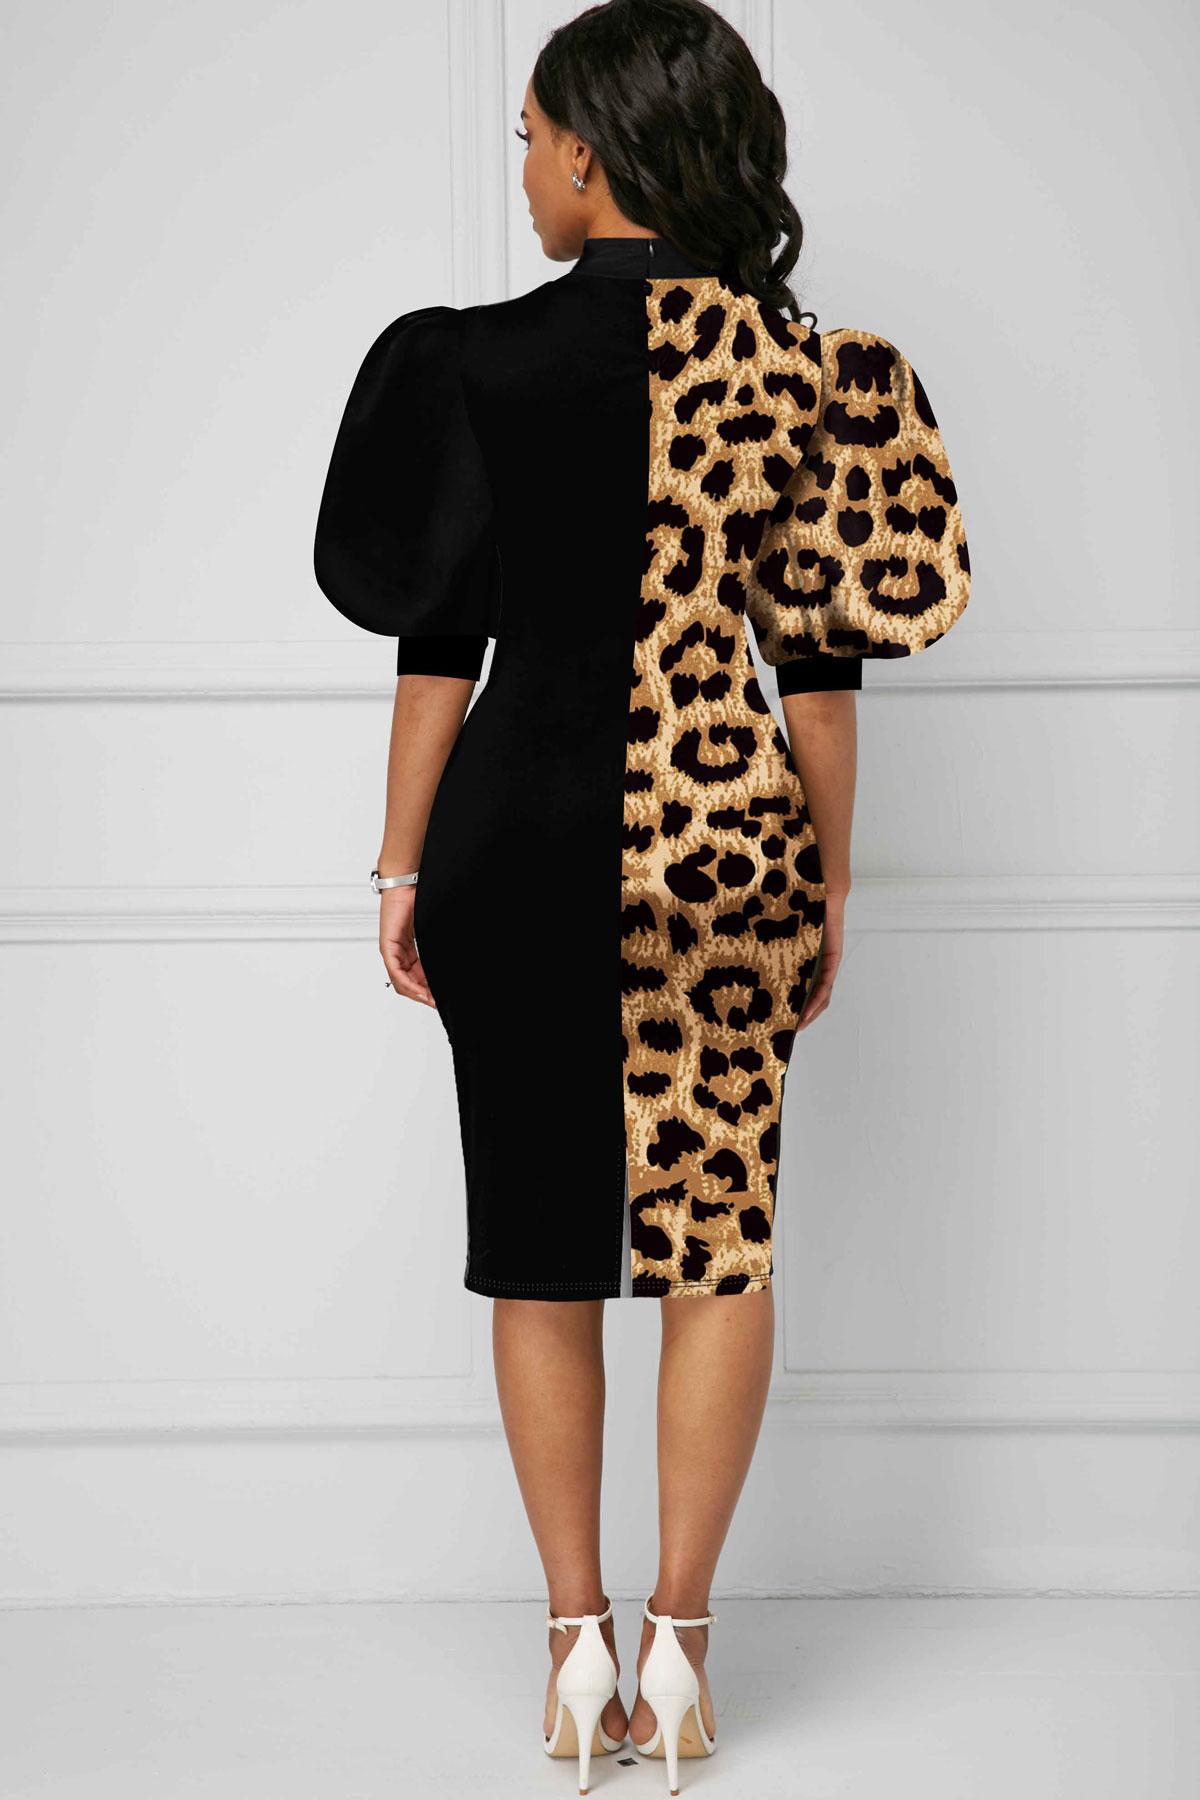 Leopard Bowknot Puff Sleeve Color Block Dress